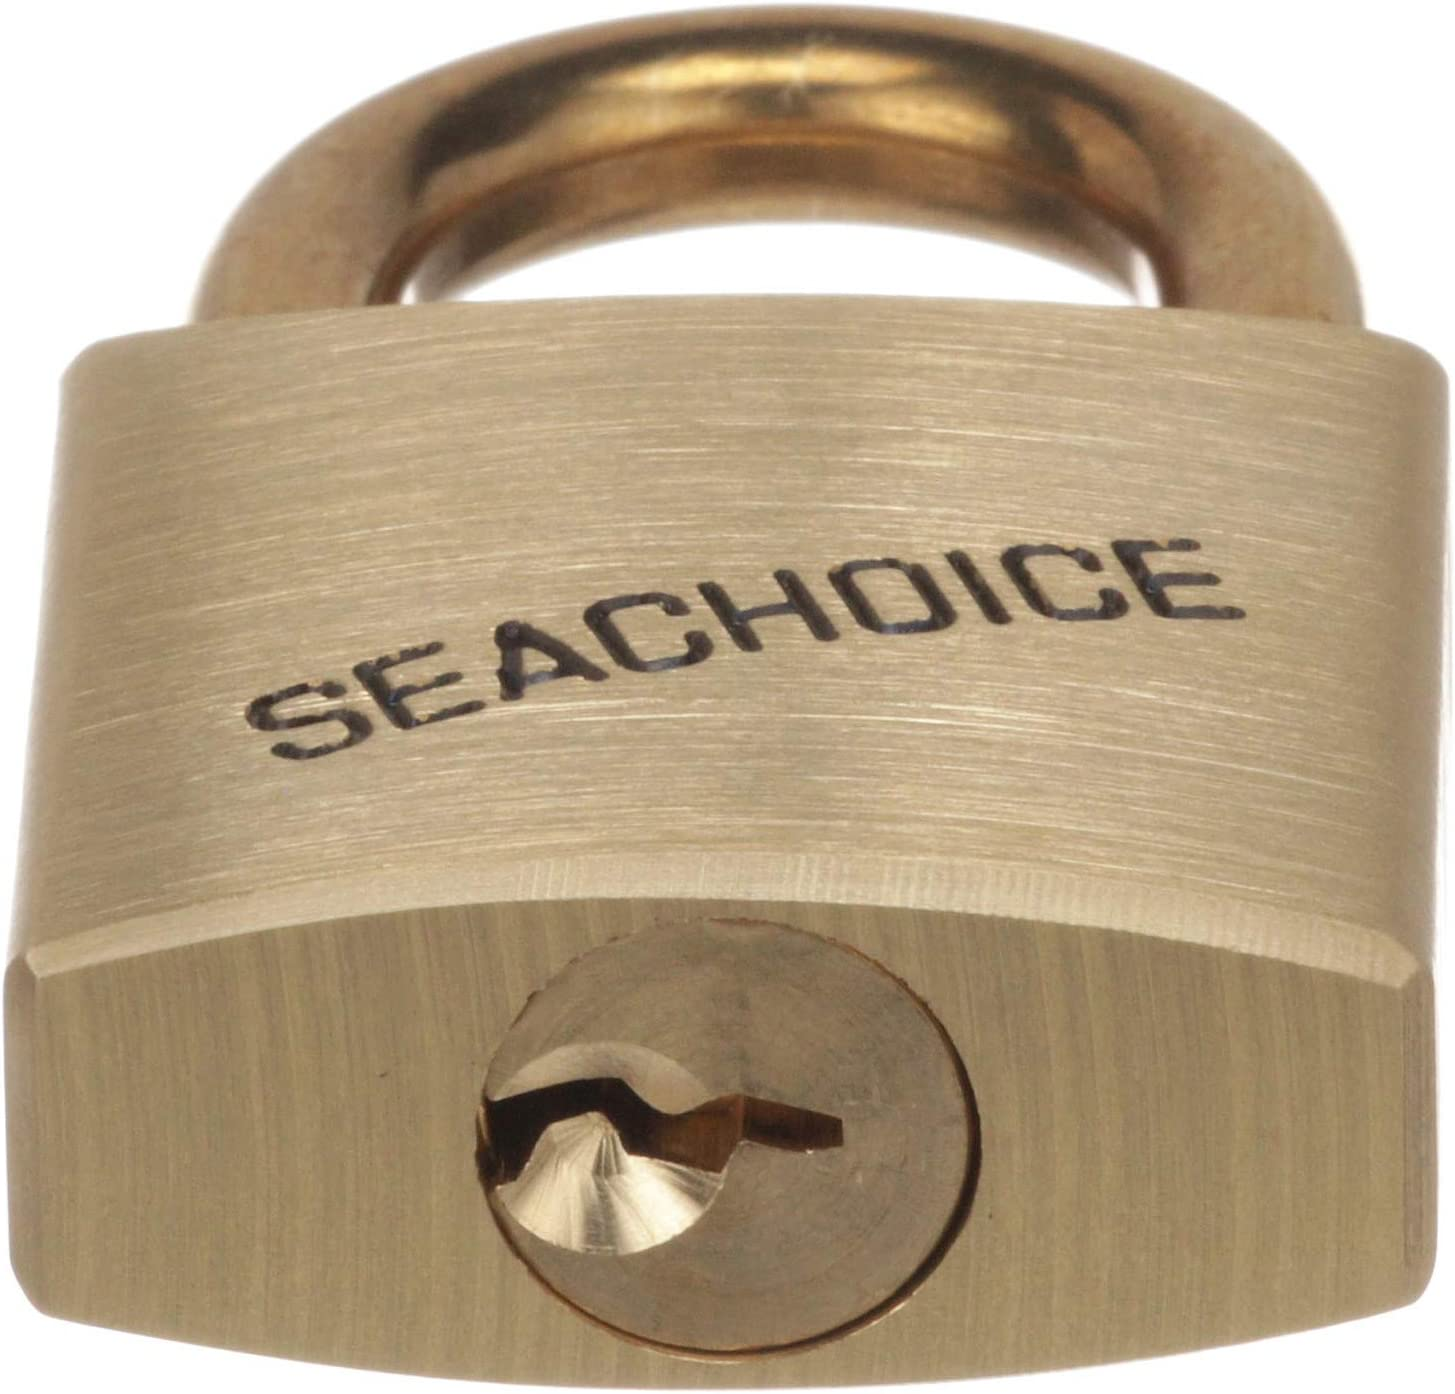 New Seachoice Solid Brass Padlock-2 Scp 37231